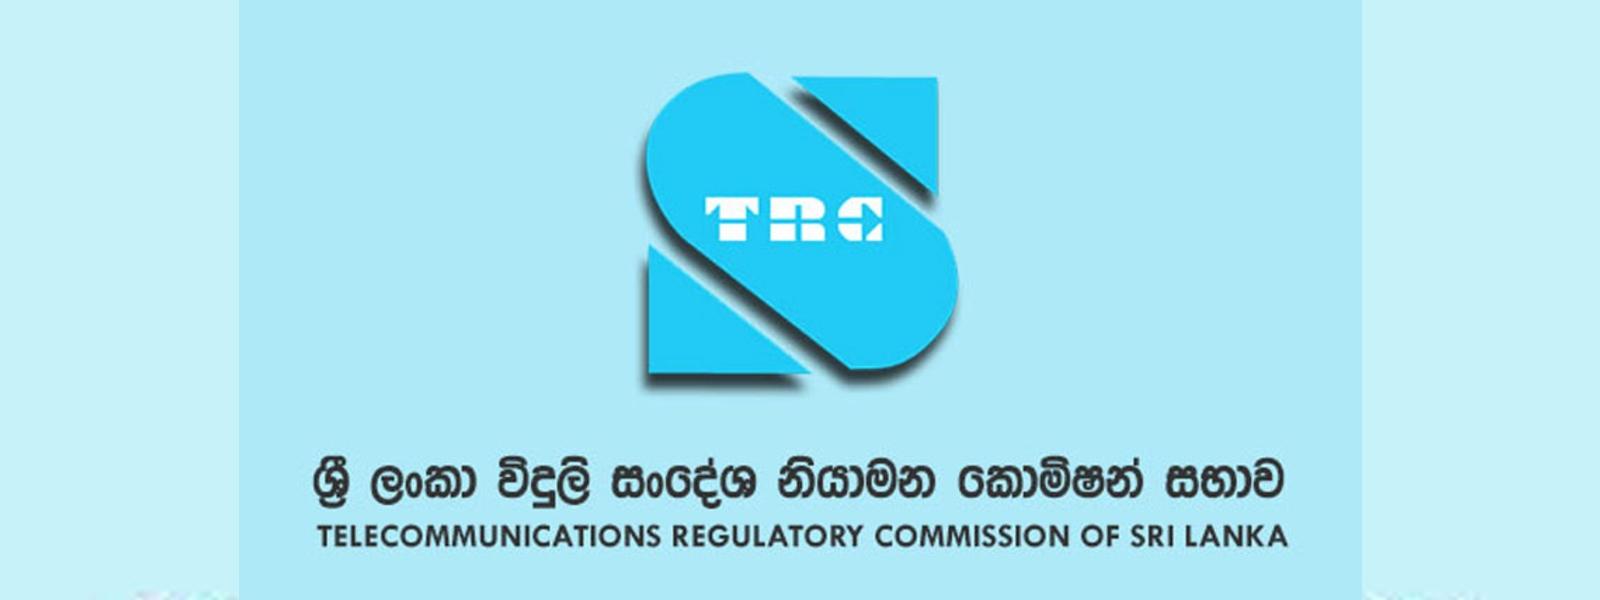 TRCSL initiates preliminary steps on Number Portability